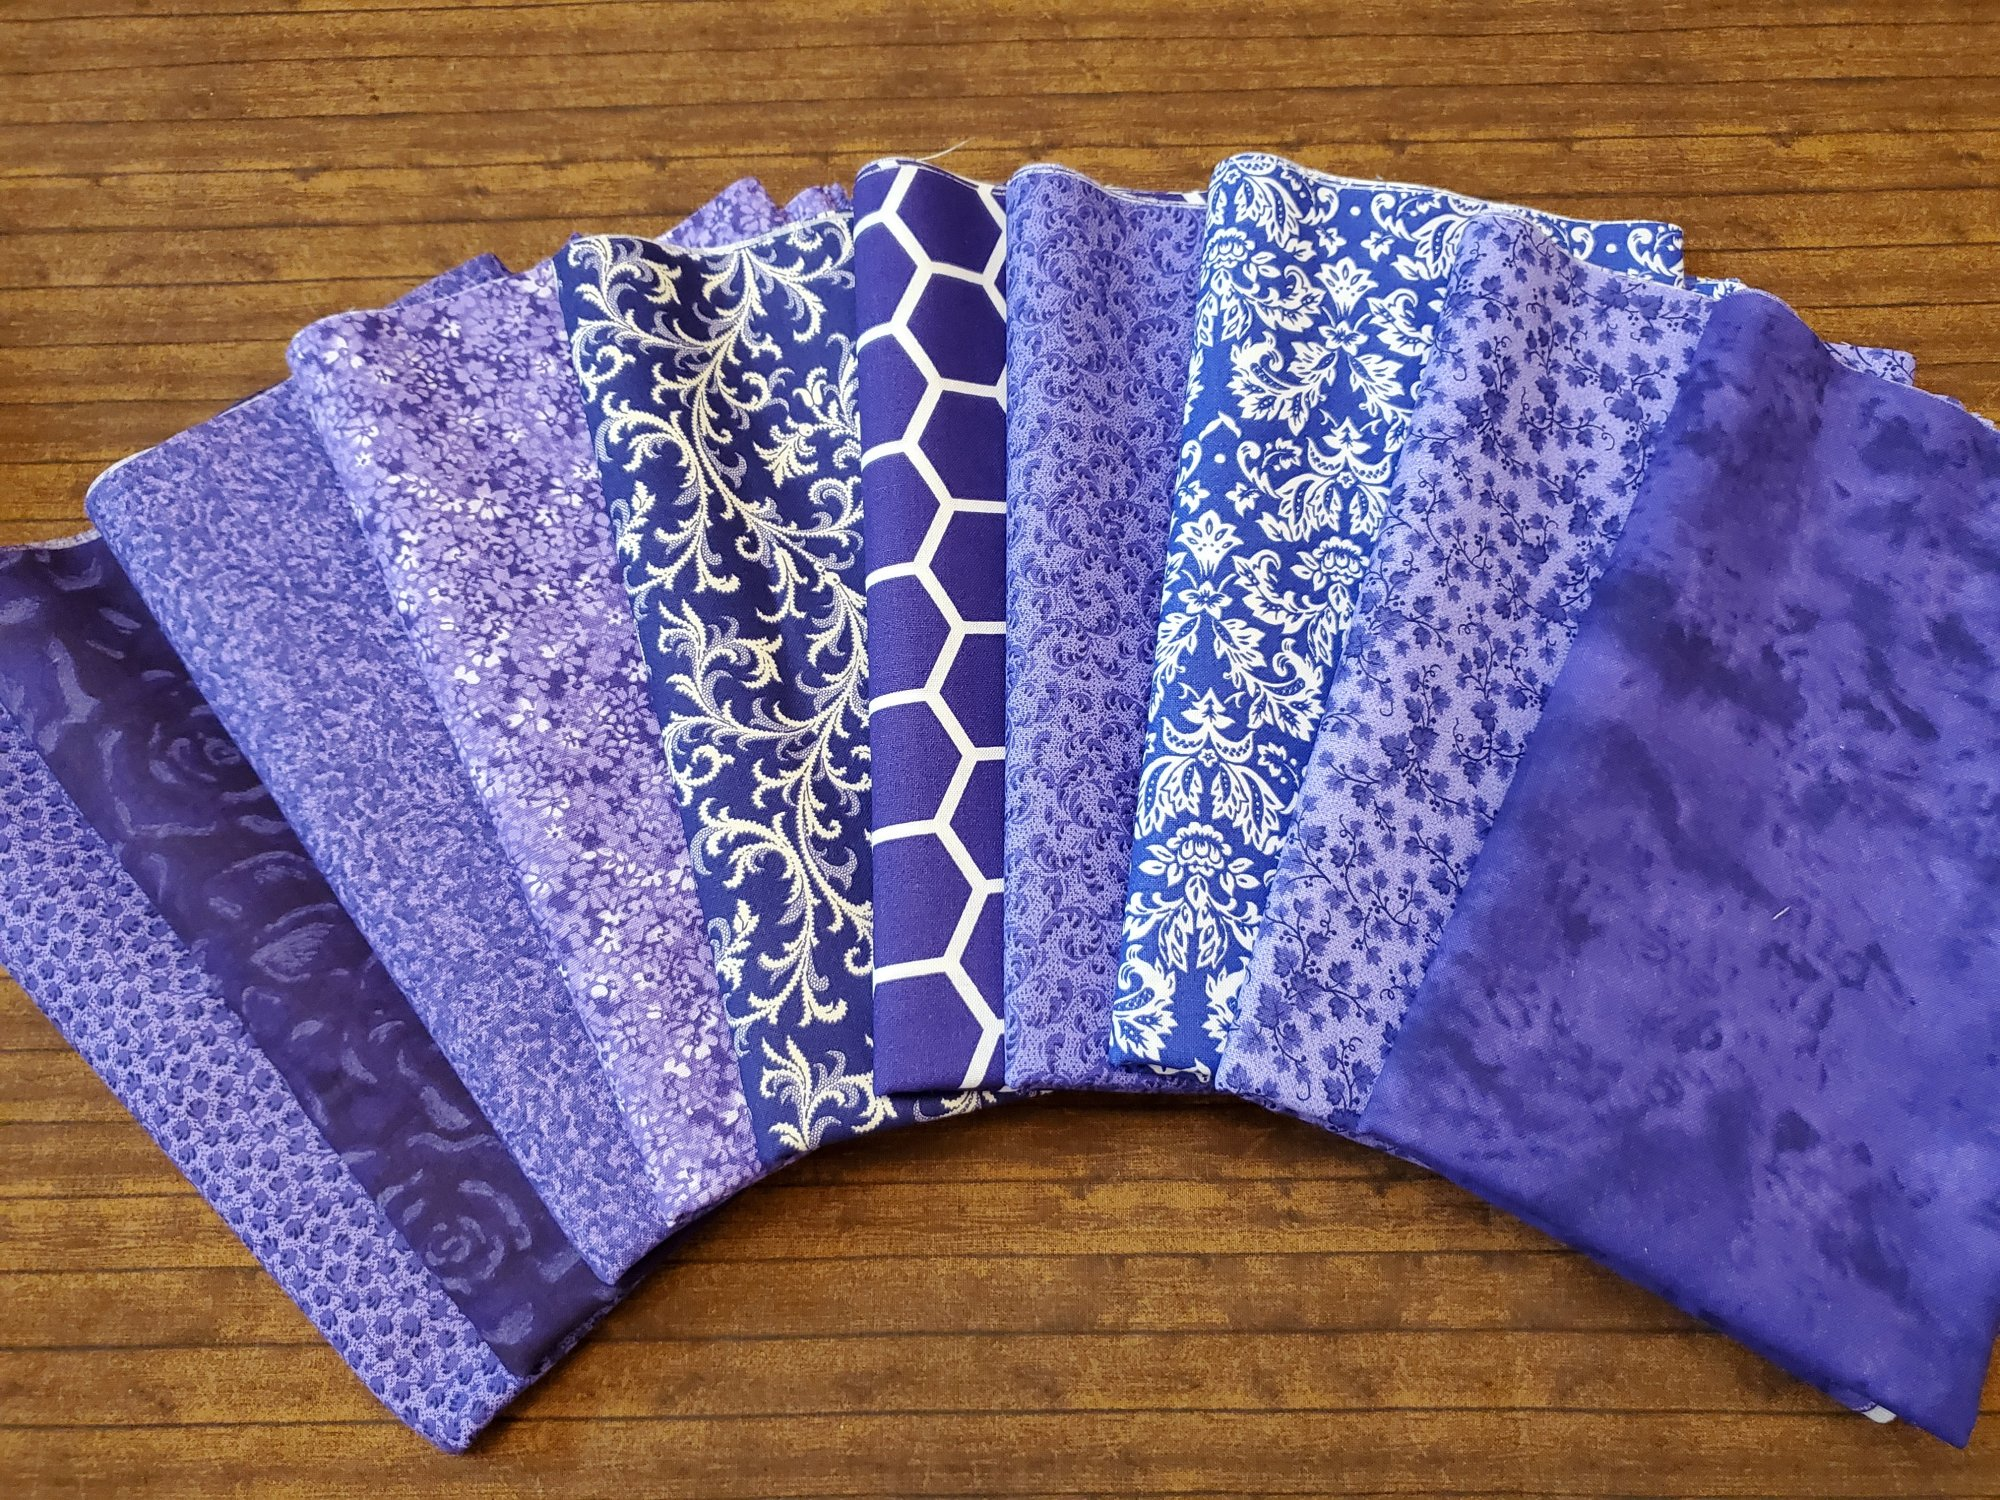 Mixed Purples - Rachael's Picks - 10 Piece Half Yard Bundle Pack